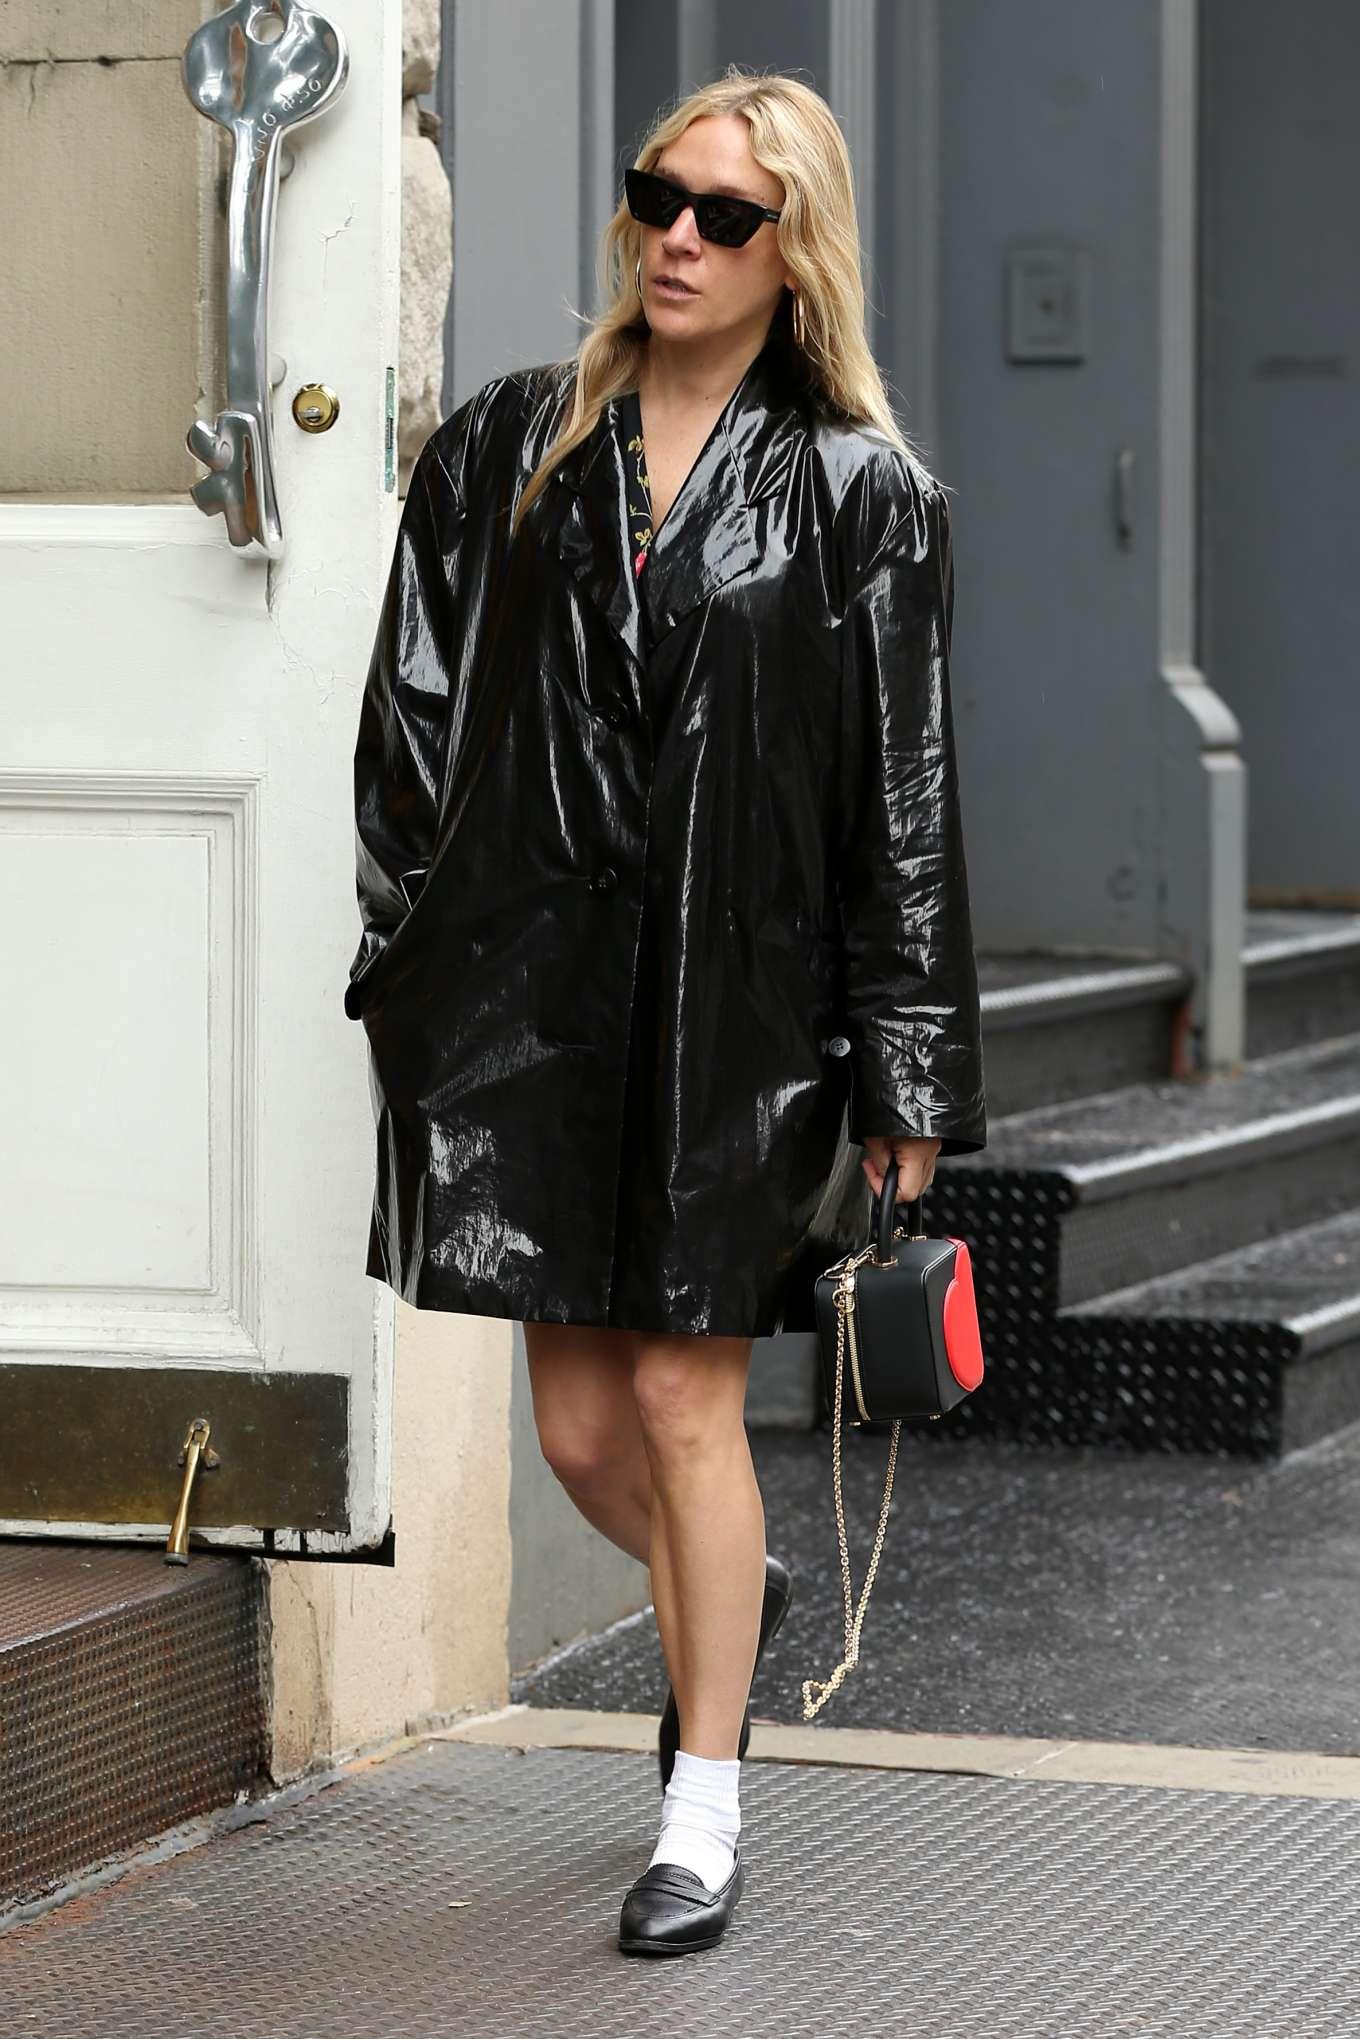 Chloe Sevigny 2019 : Chloe Sevigny in Black Coat at Olives-04